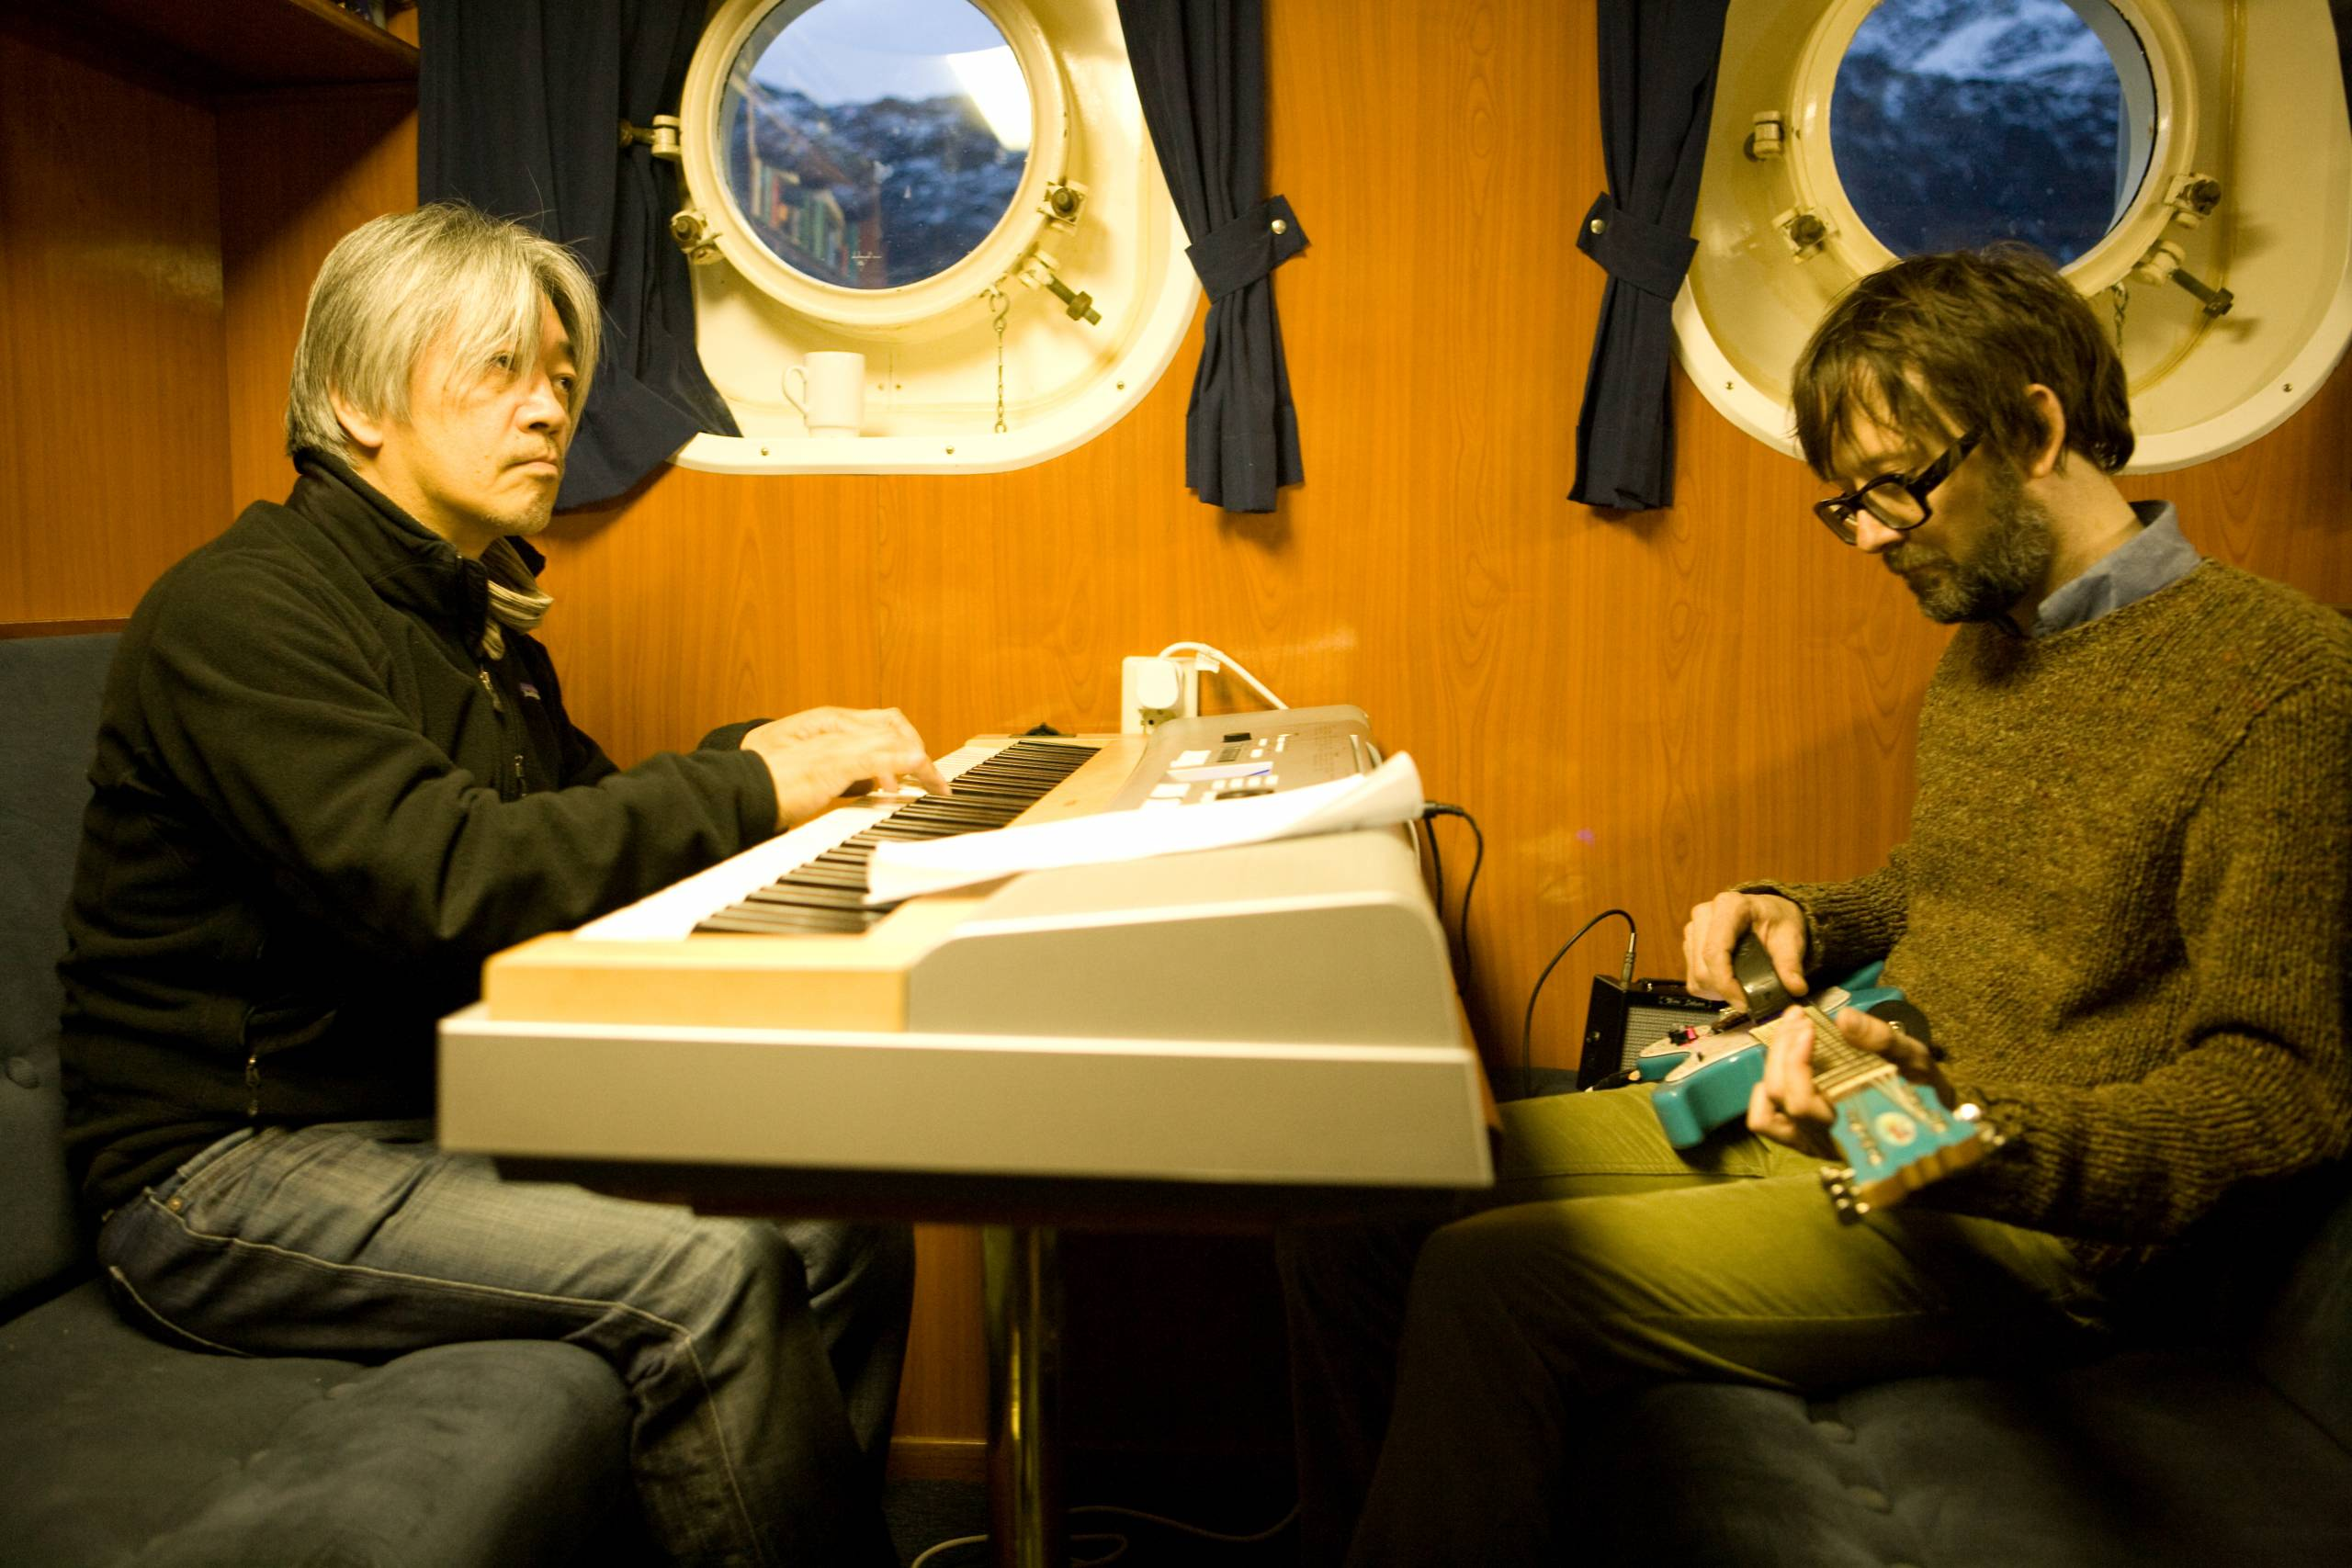 musicians in a boat cabin